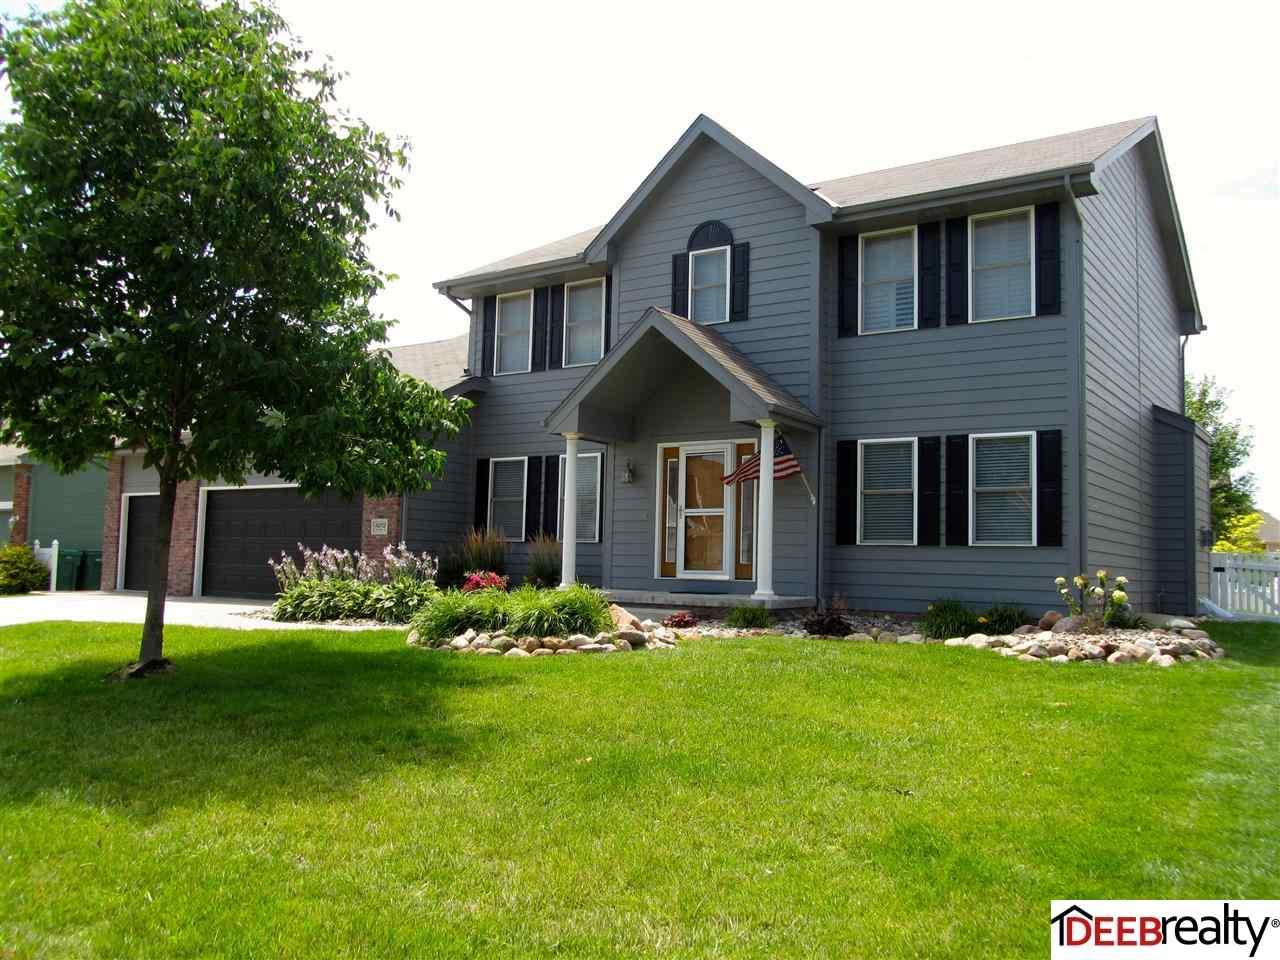 Real Estate for Sale, ListingId: 29211917, La Vista,NE68128